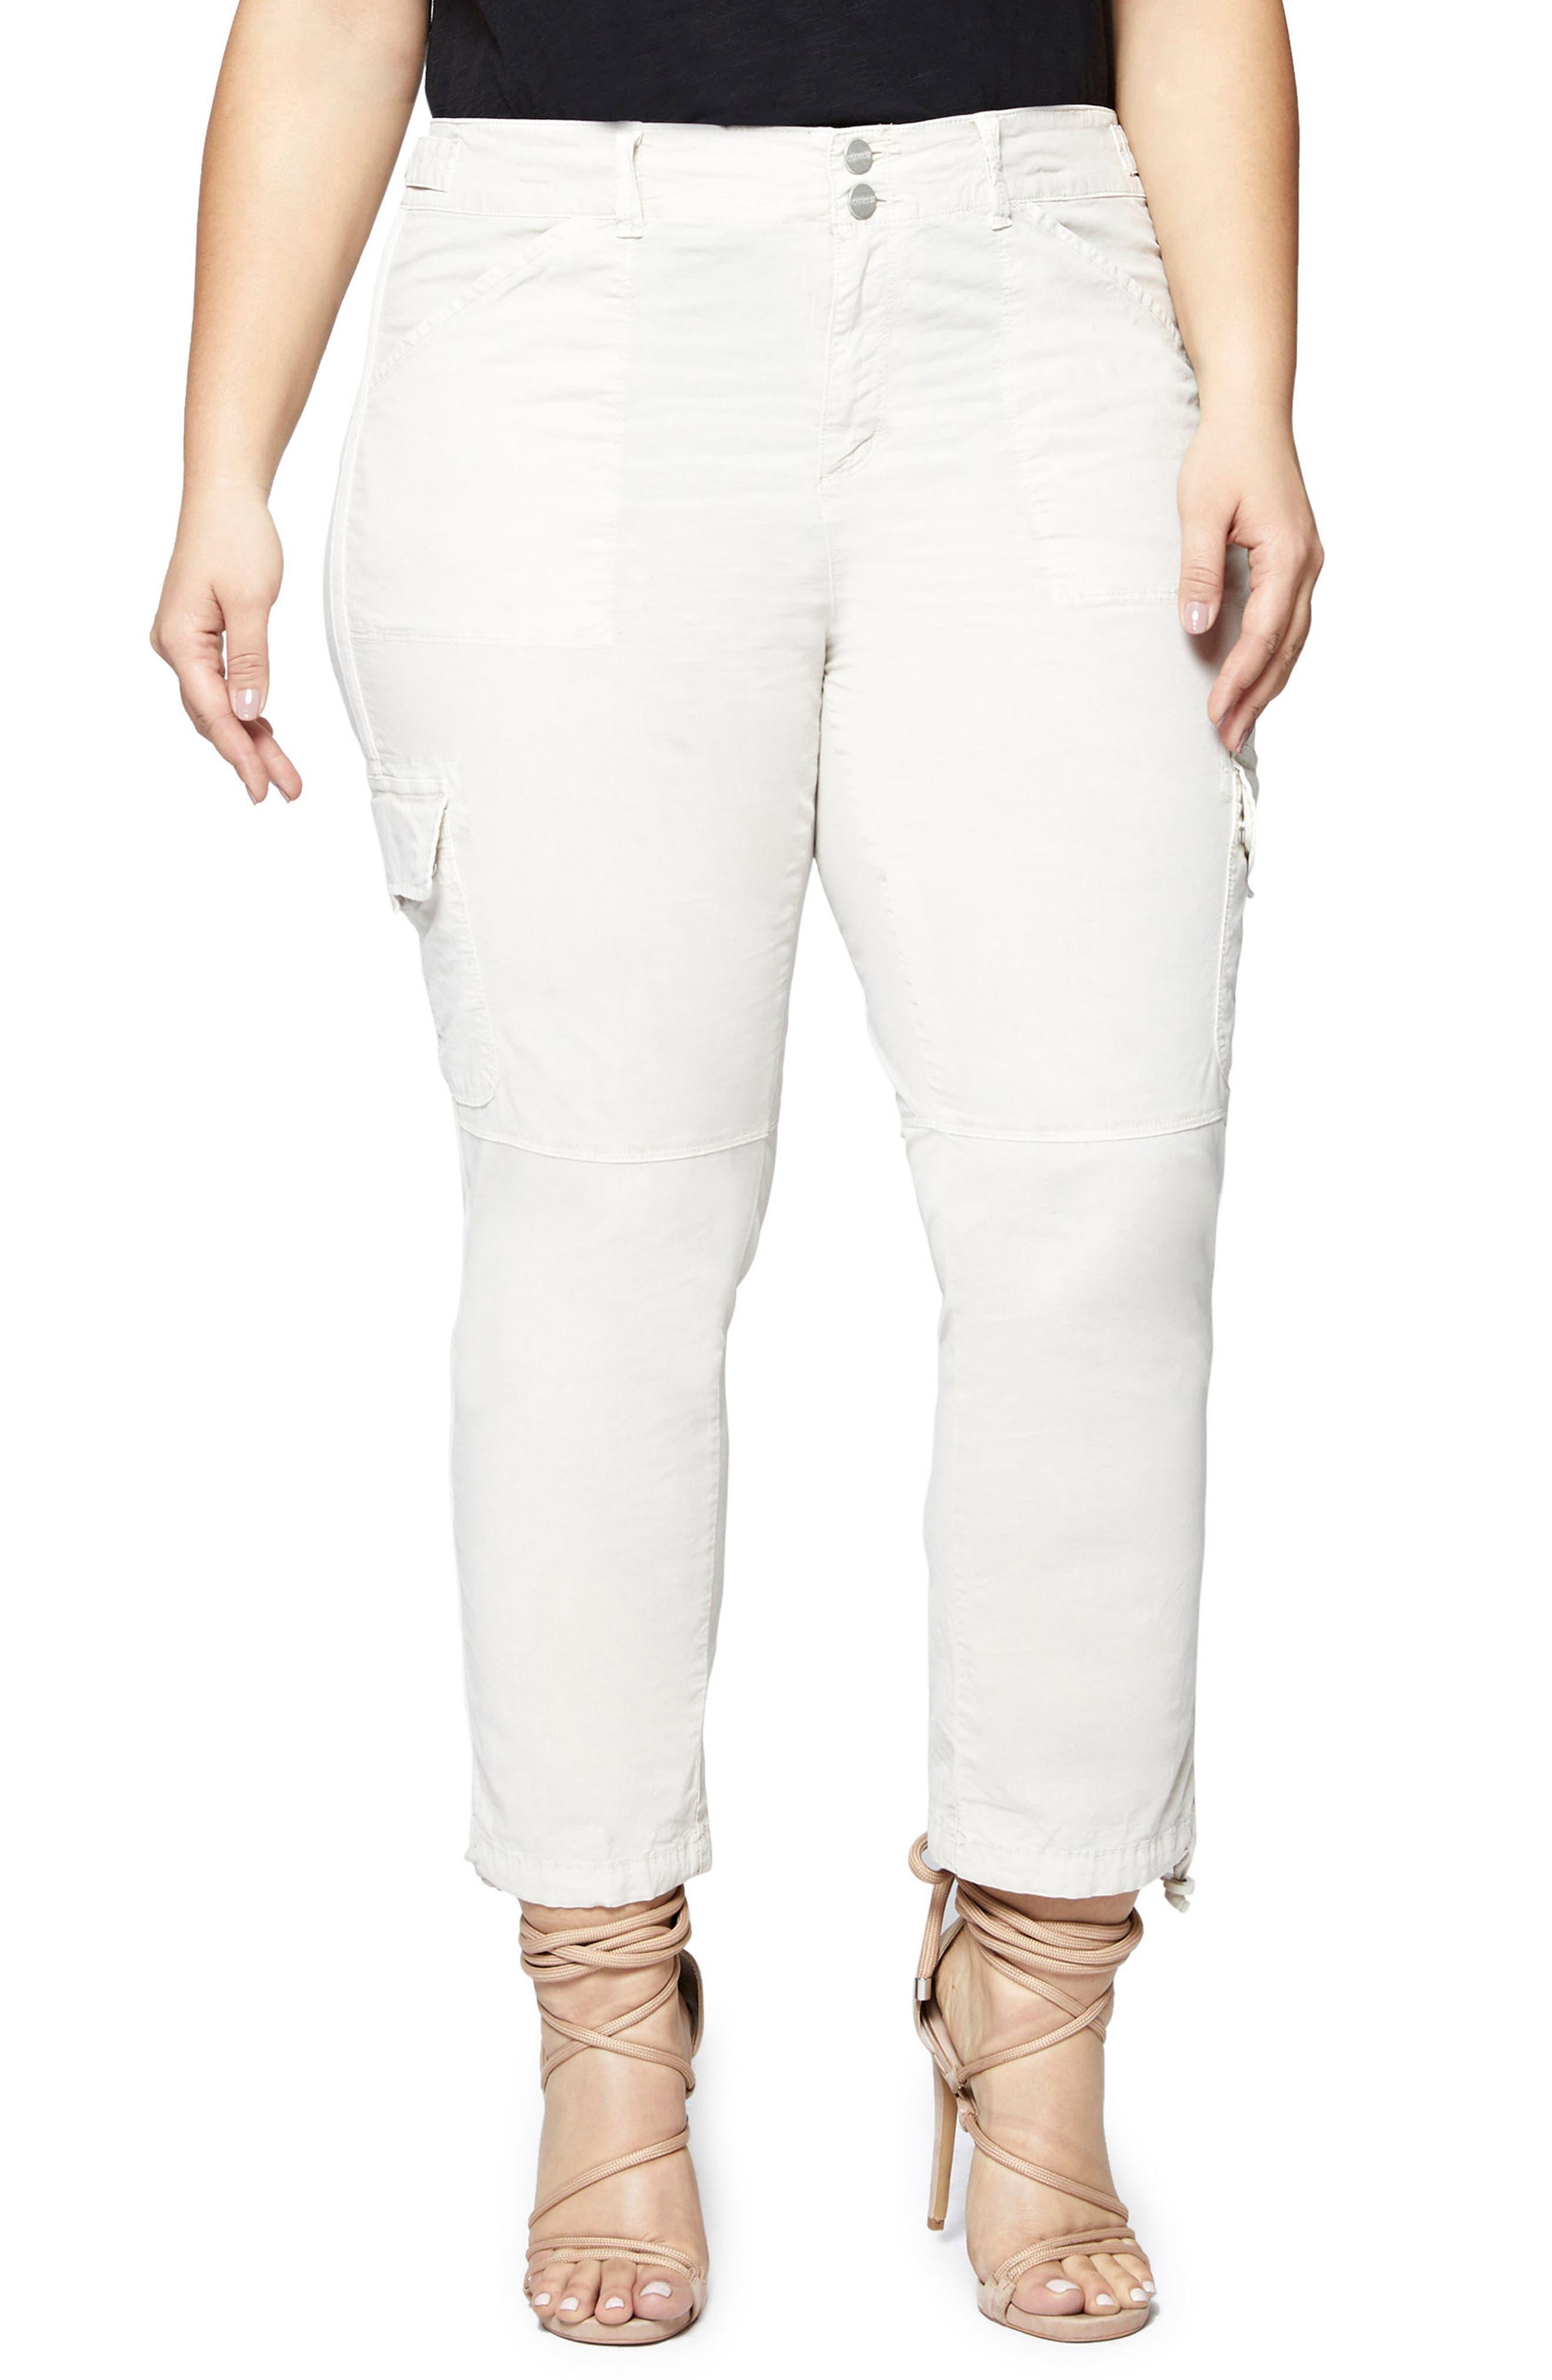 Terrain Crop Cargo Pants,                         Main,                         color, DESERT SAND